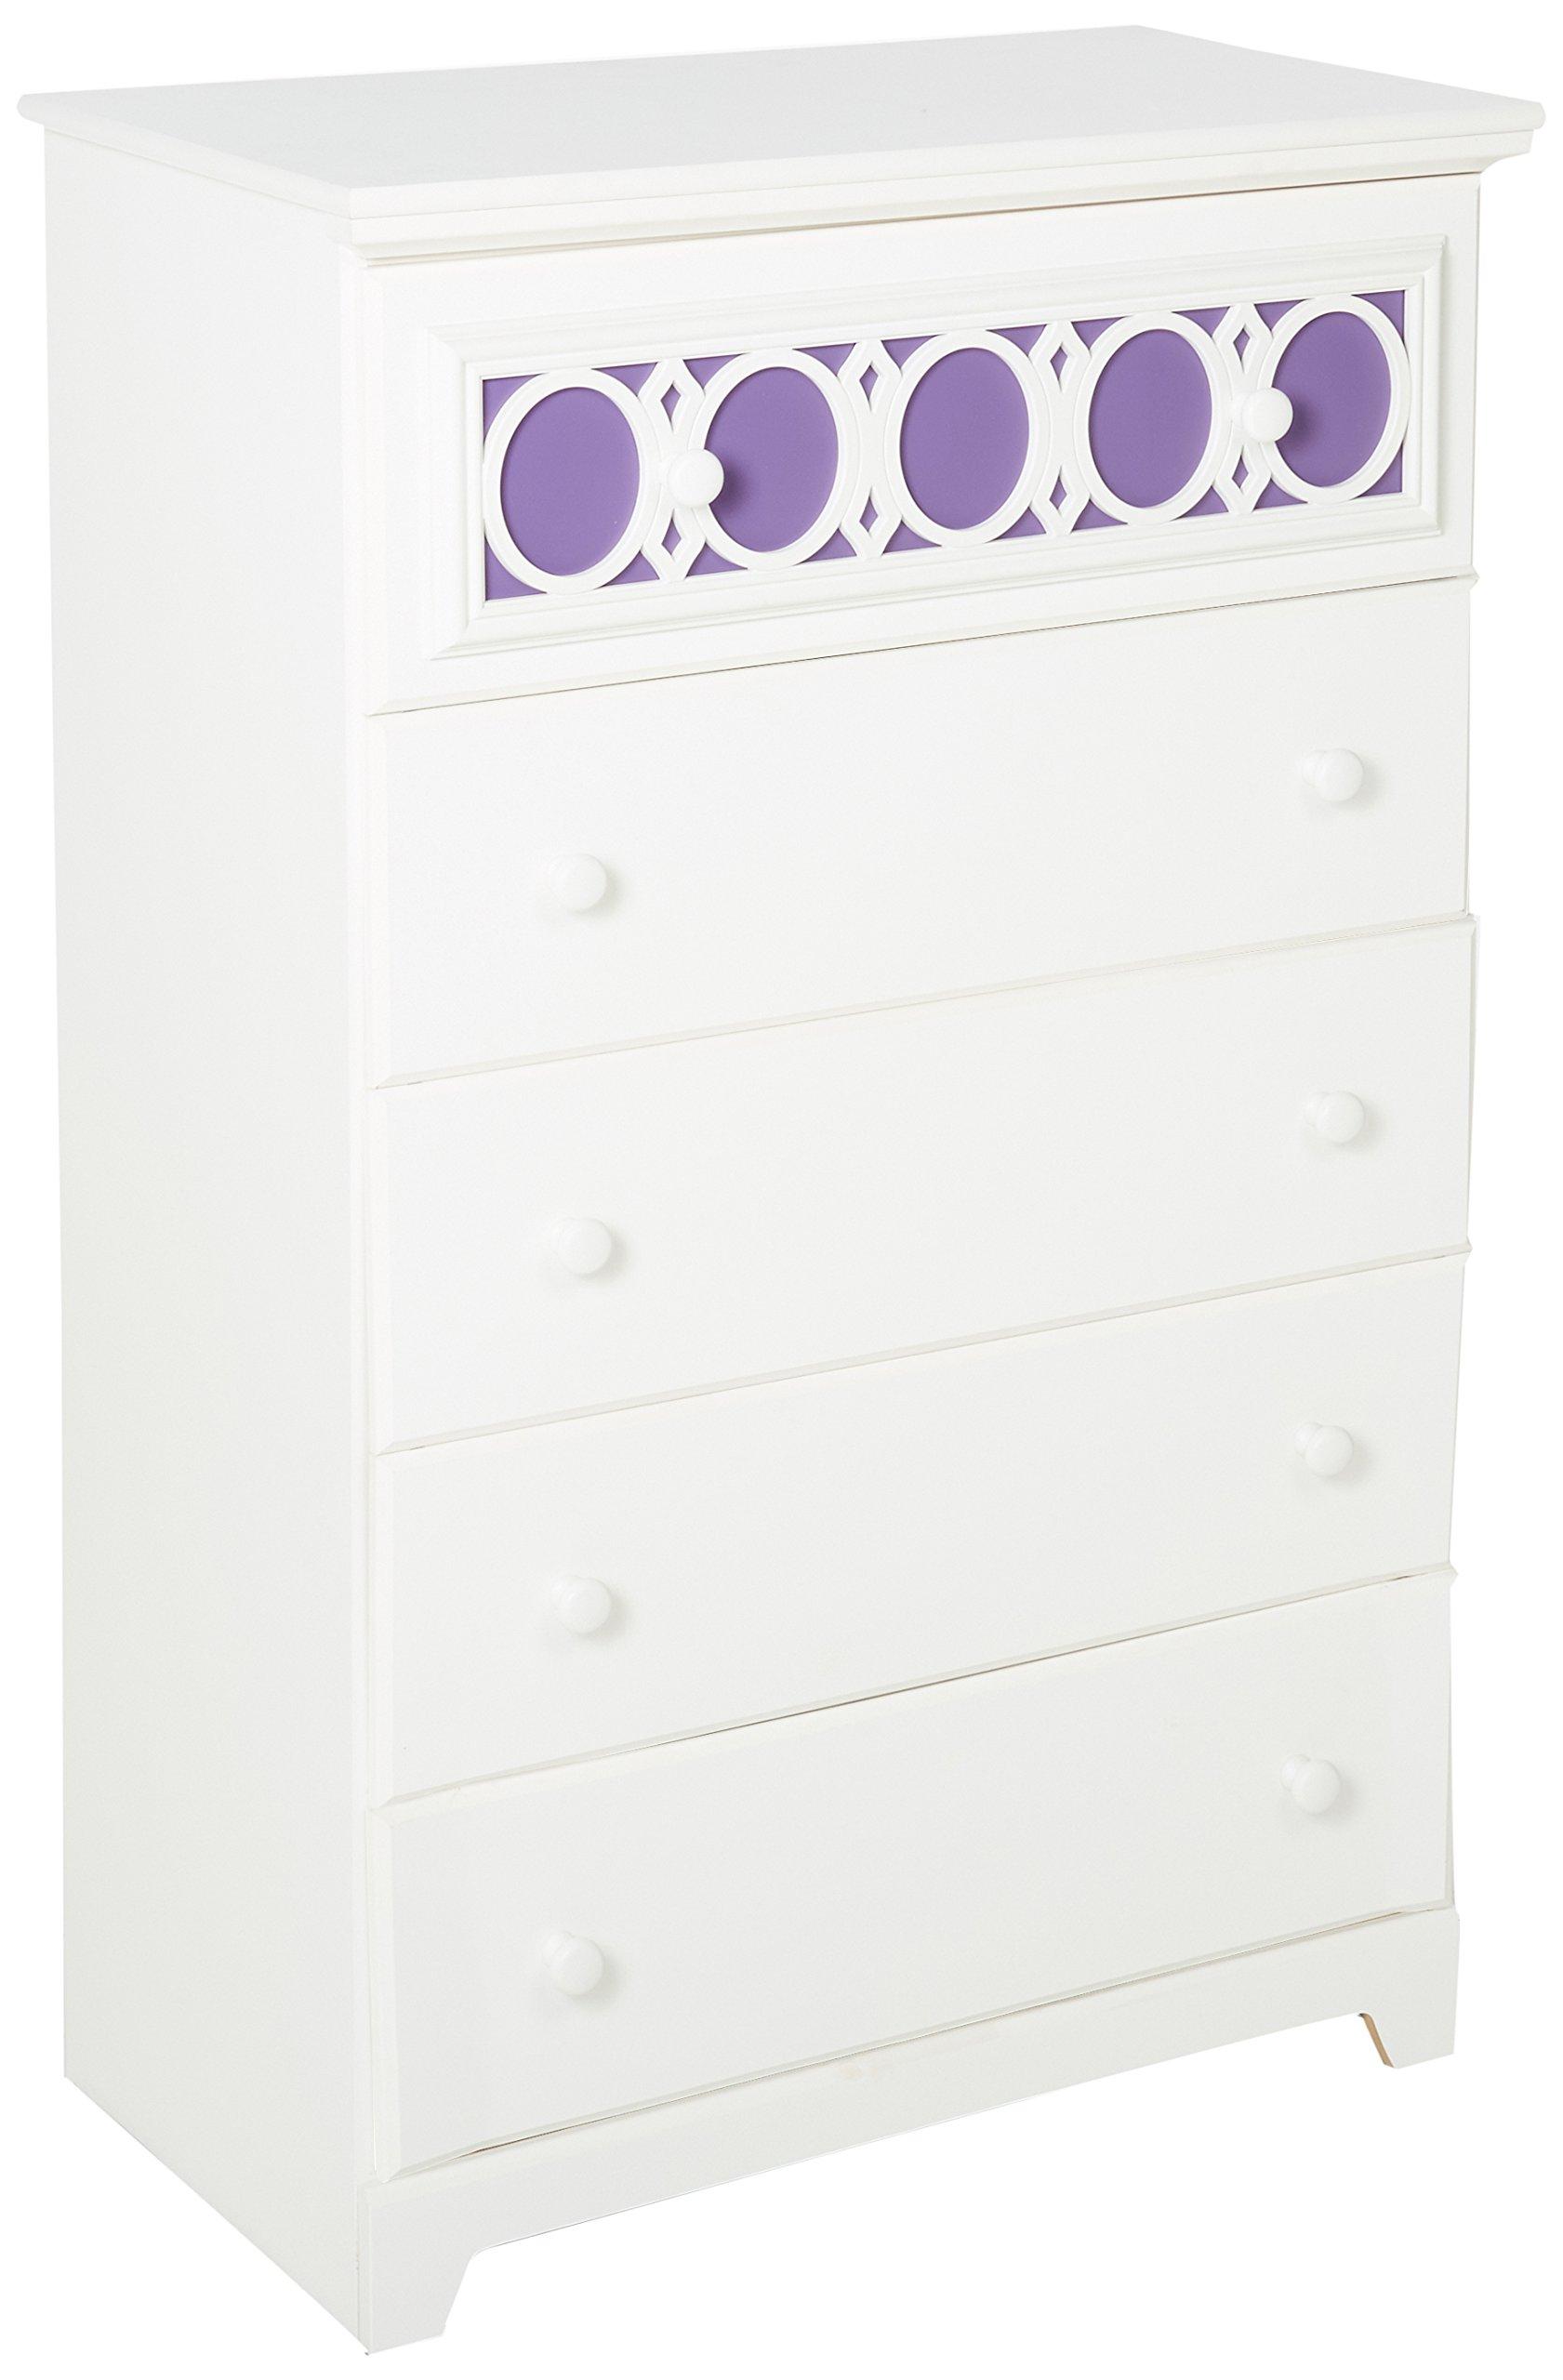 Ashley Furniture Signature Design - Zayley Chest of Drawers - 5 Drawers - Interchangable Panels - Contemporary - White by Signature Design by Ashley (Image #1)